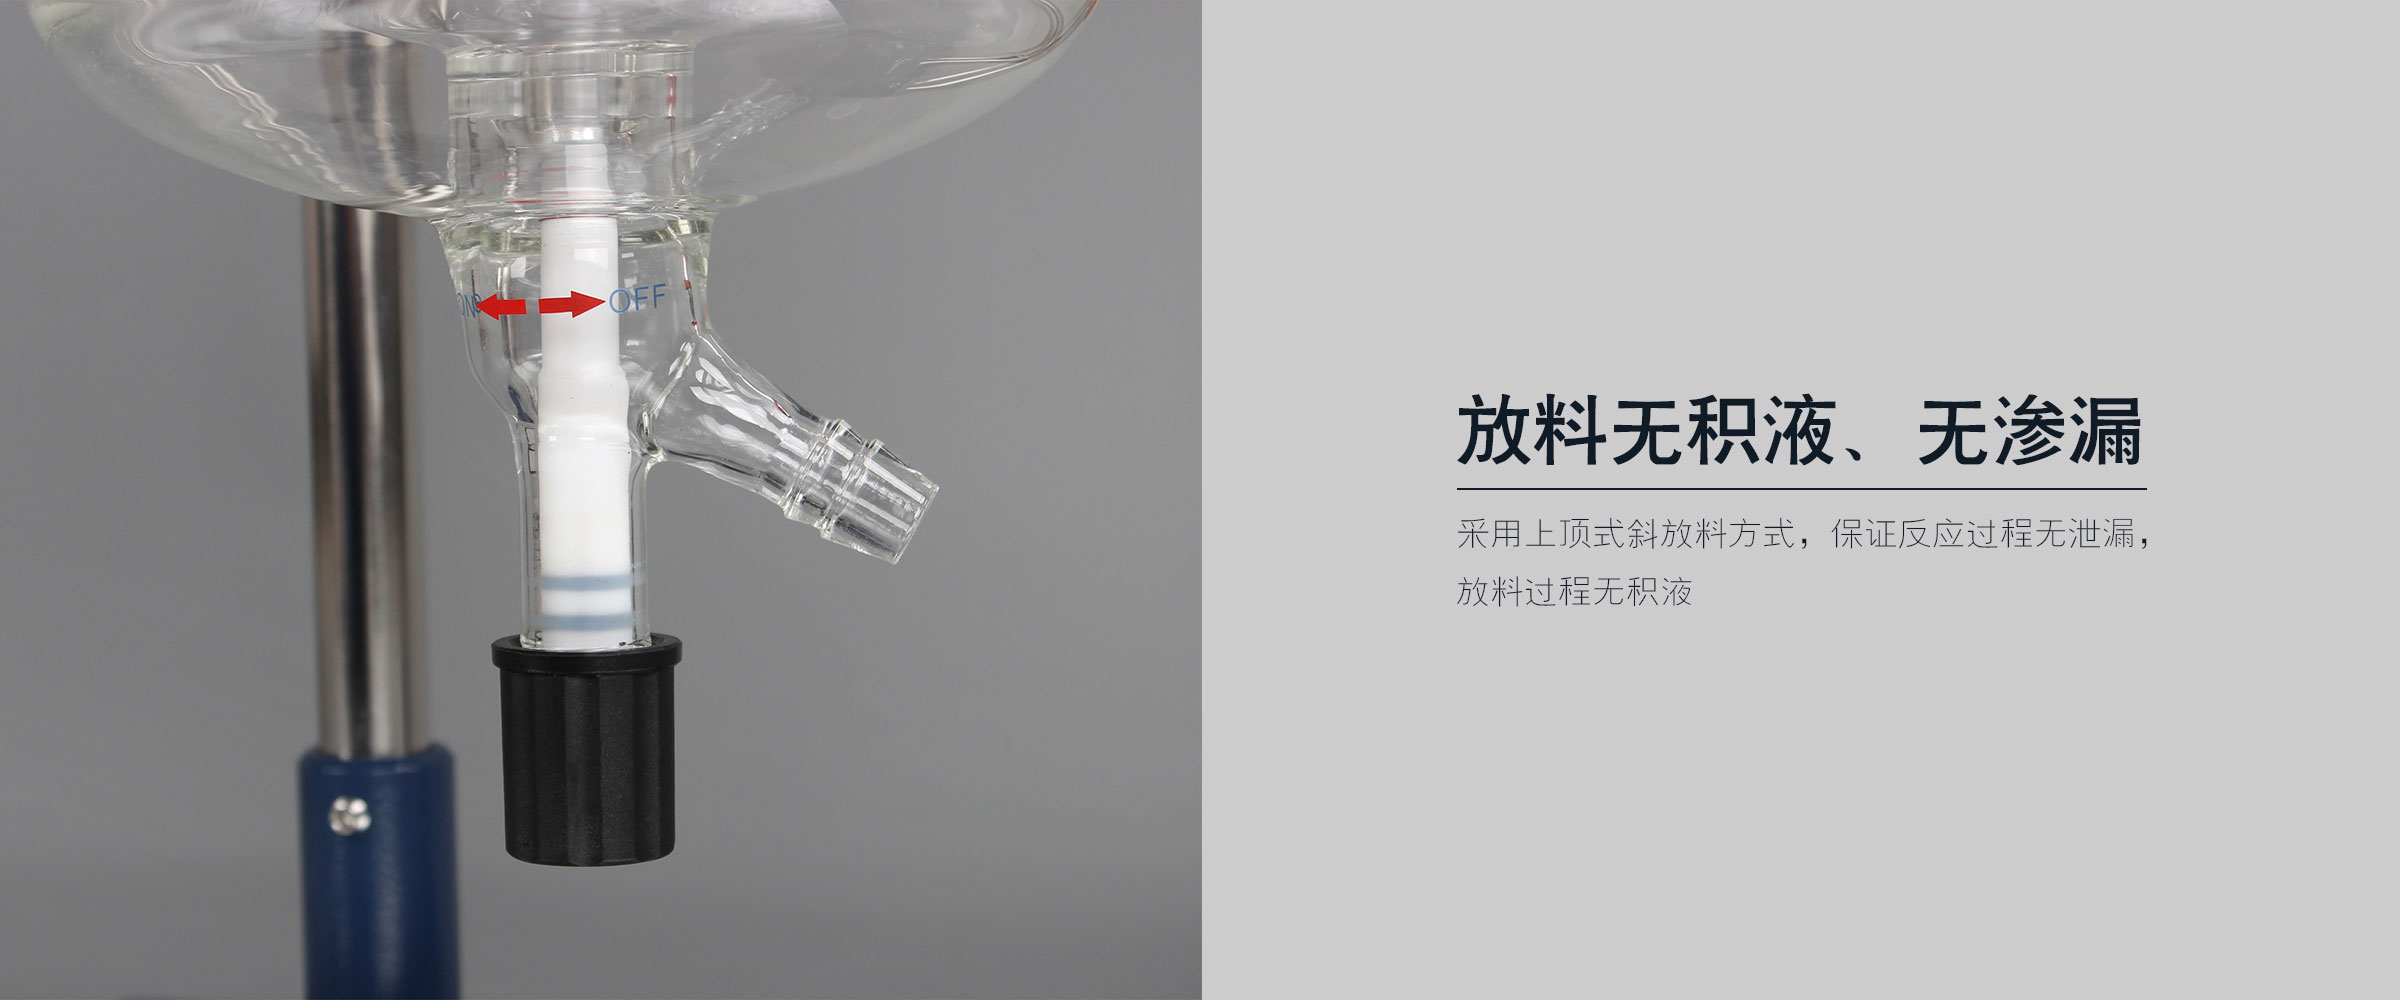 玻璃反应釜 (8)